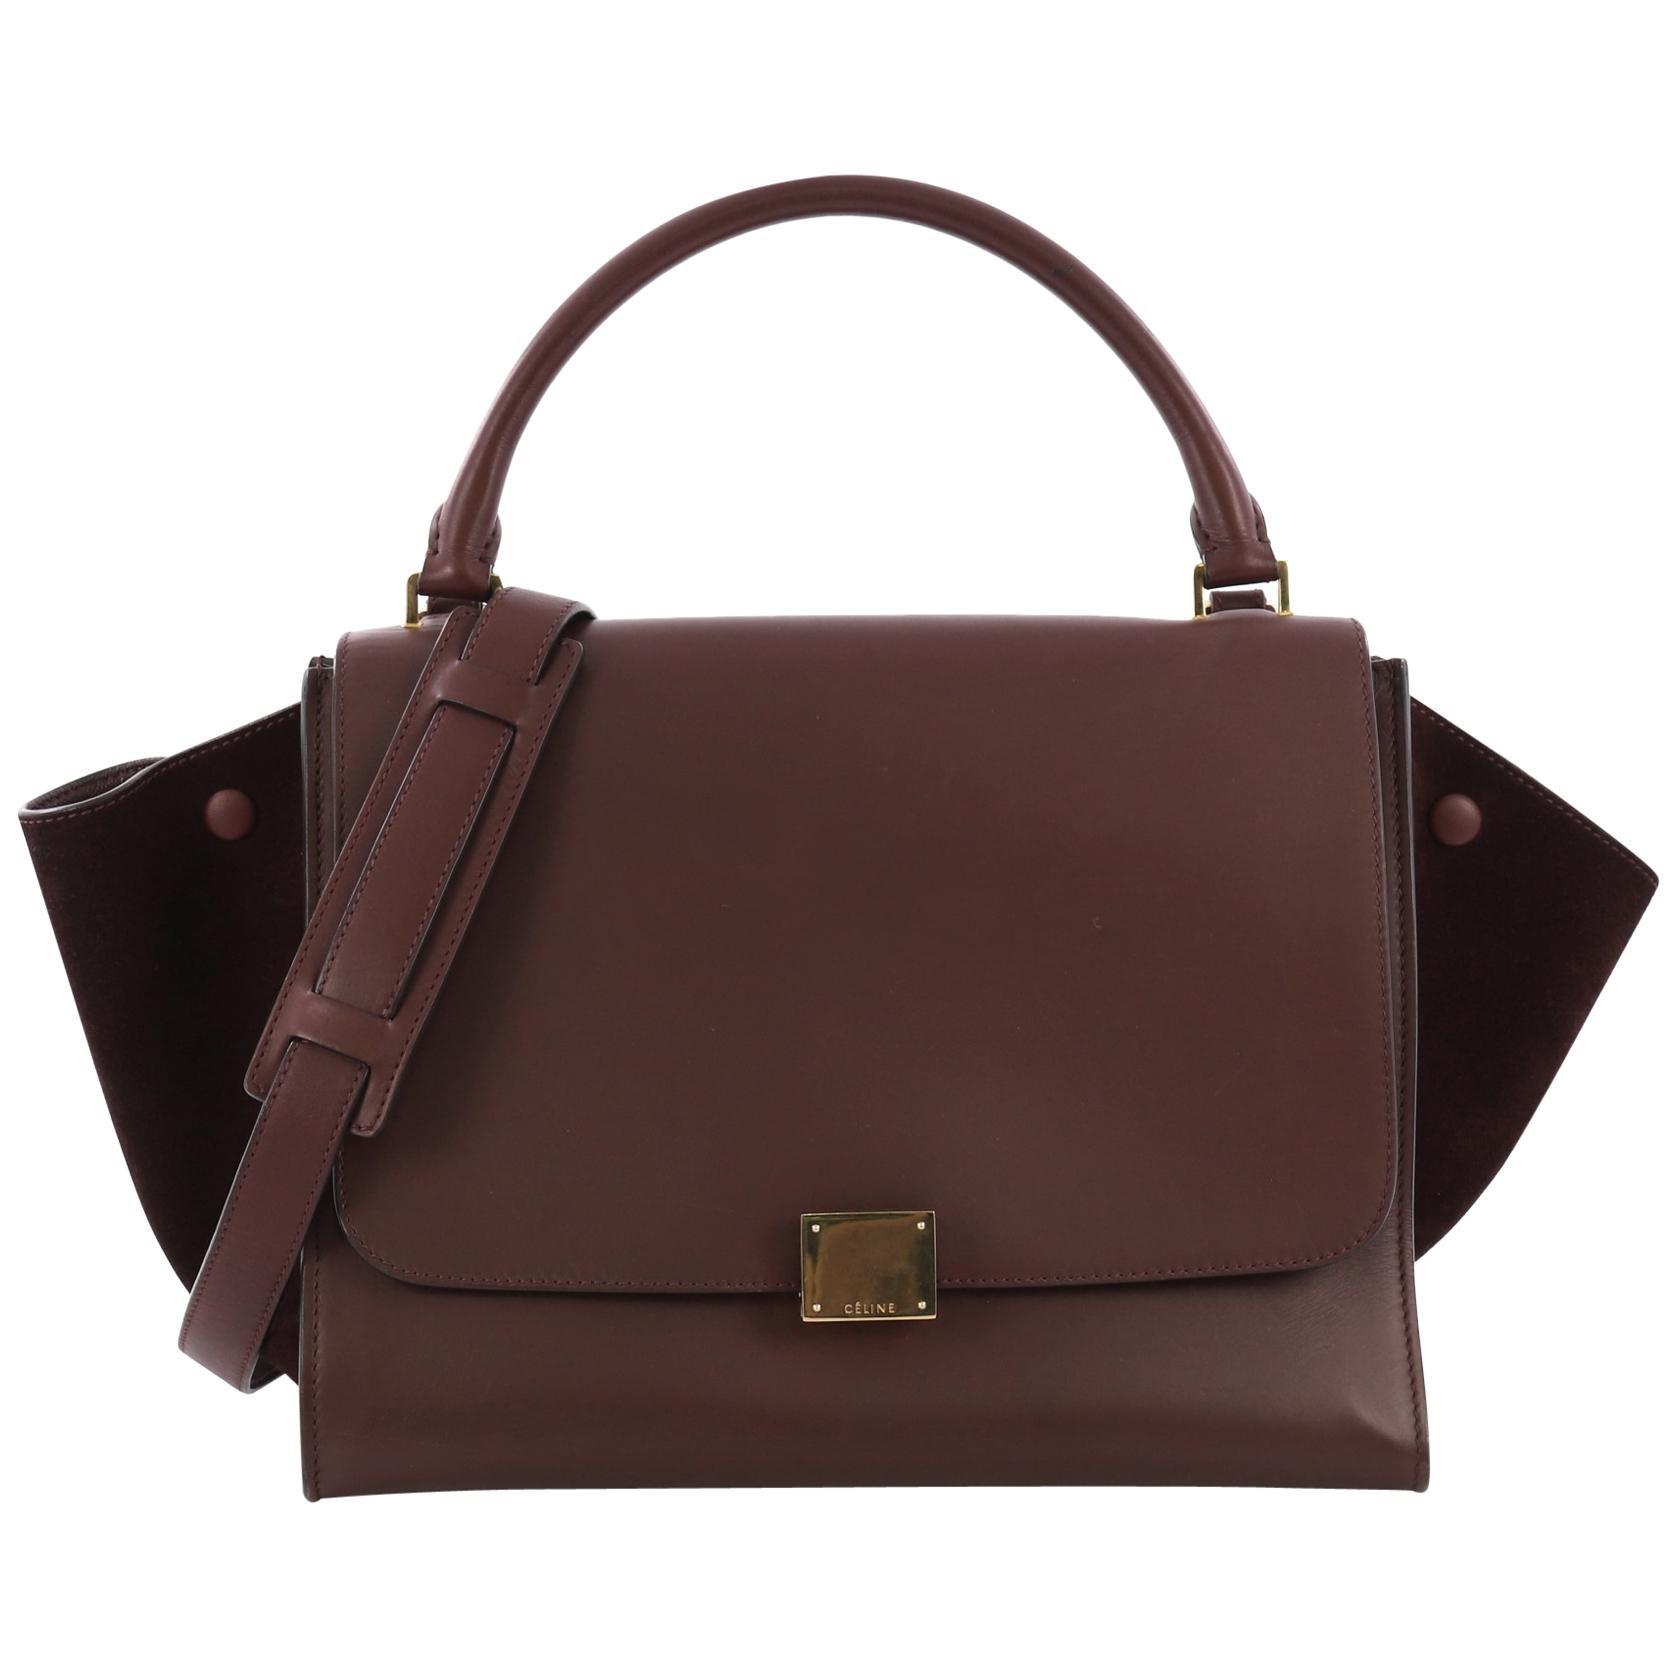 9b3d4e9e96c7 Celine leather handbags for sale on stdibs jpg 1677x1677 Leather handbags  celine boston bag